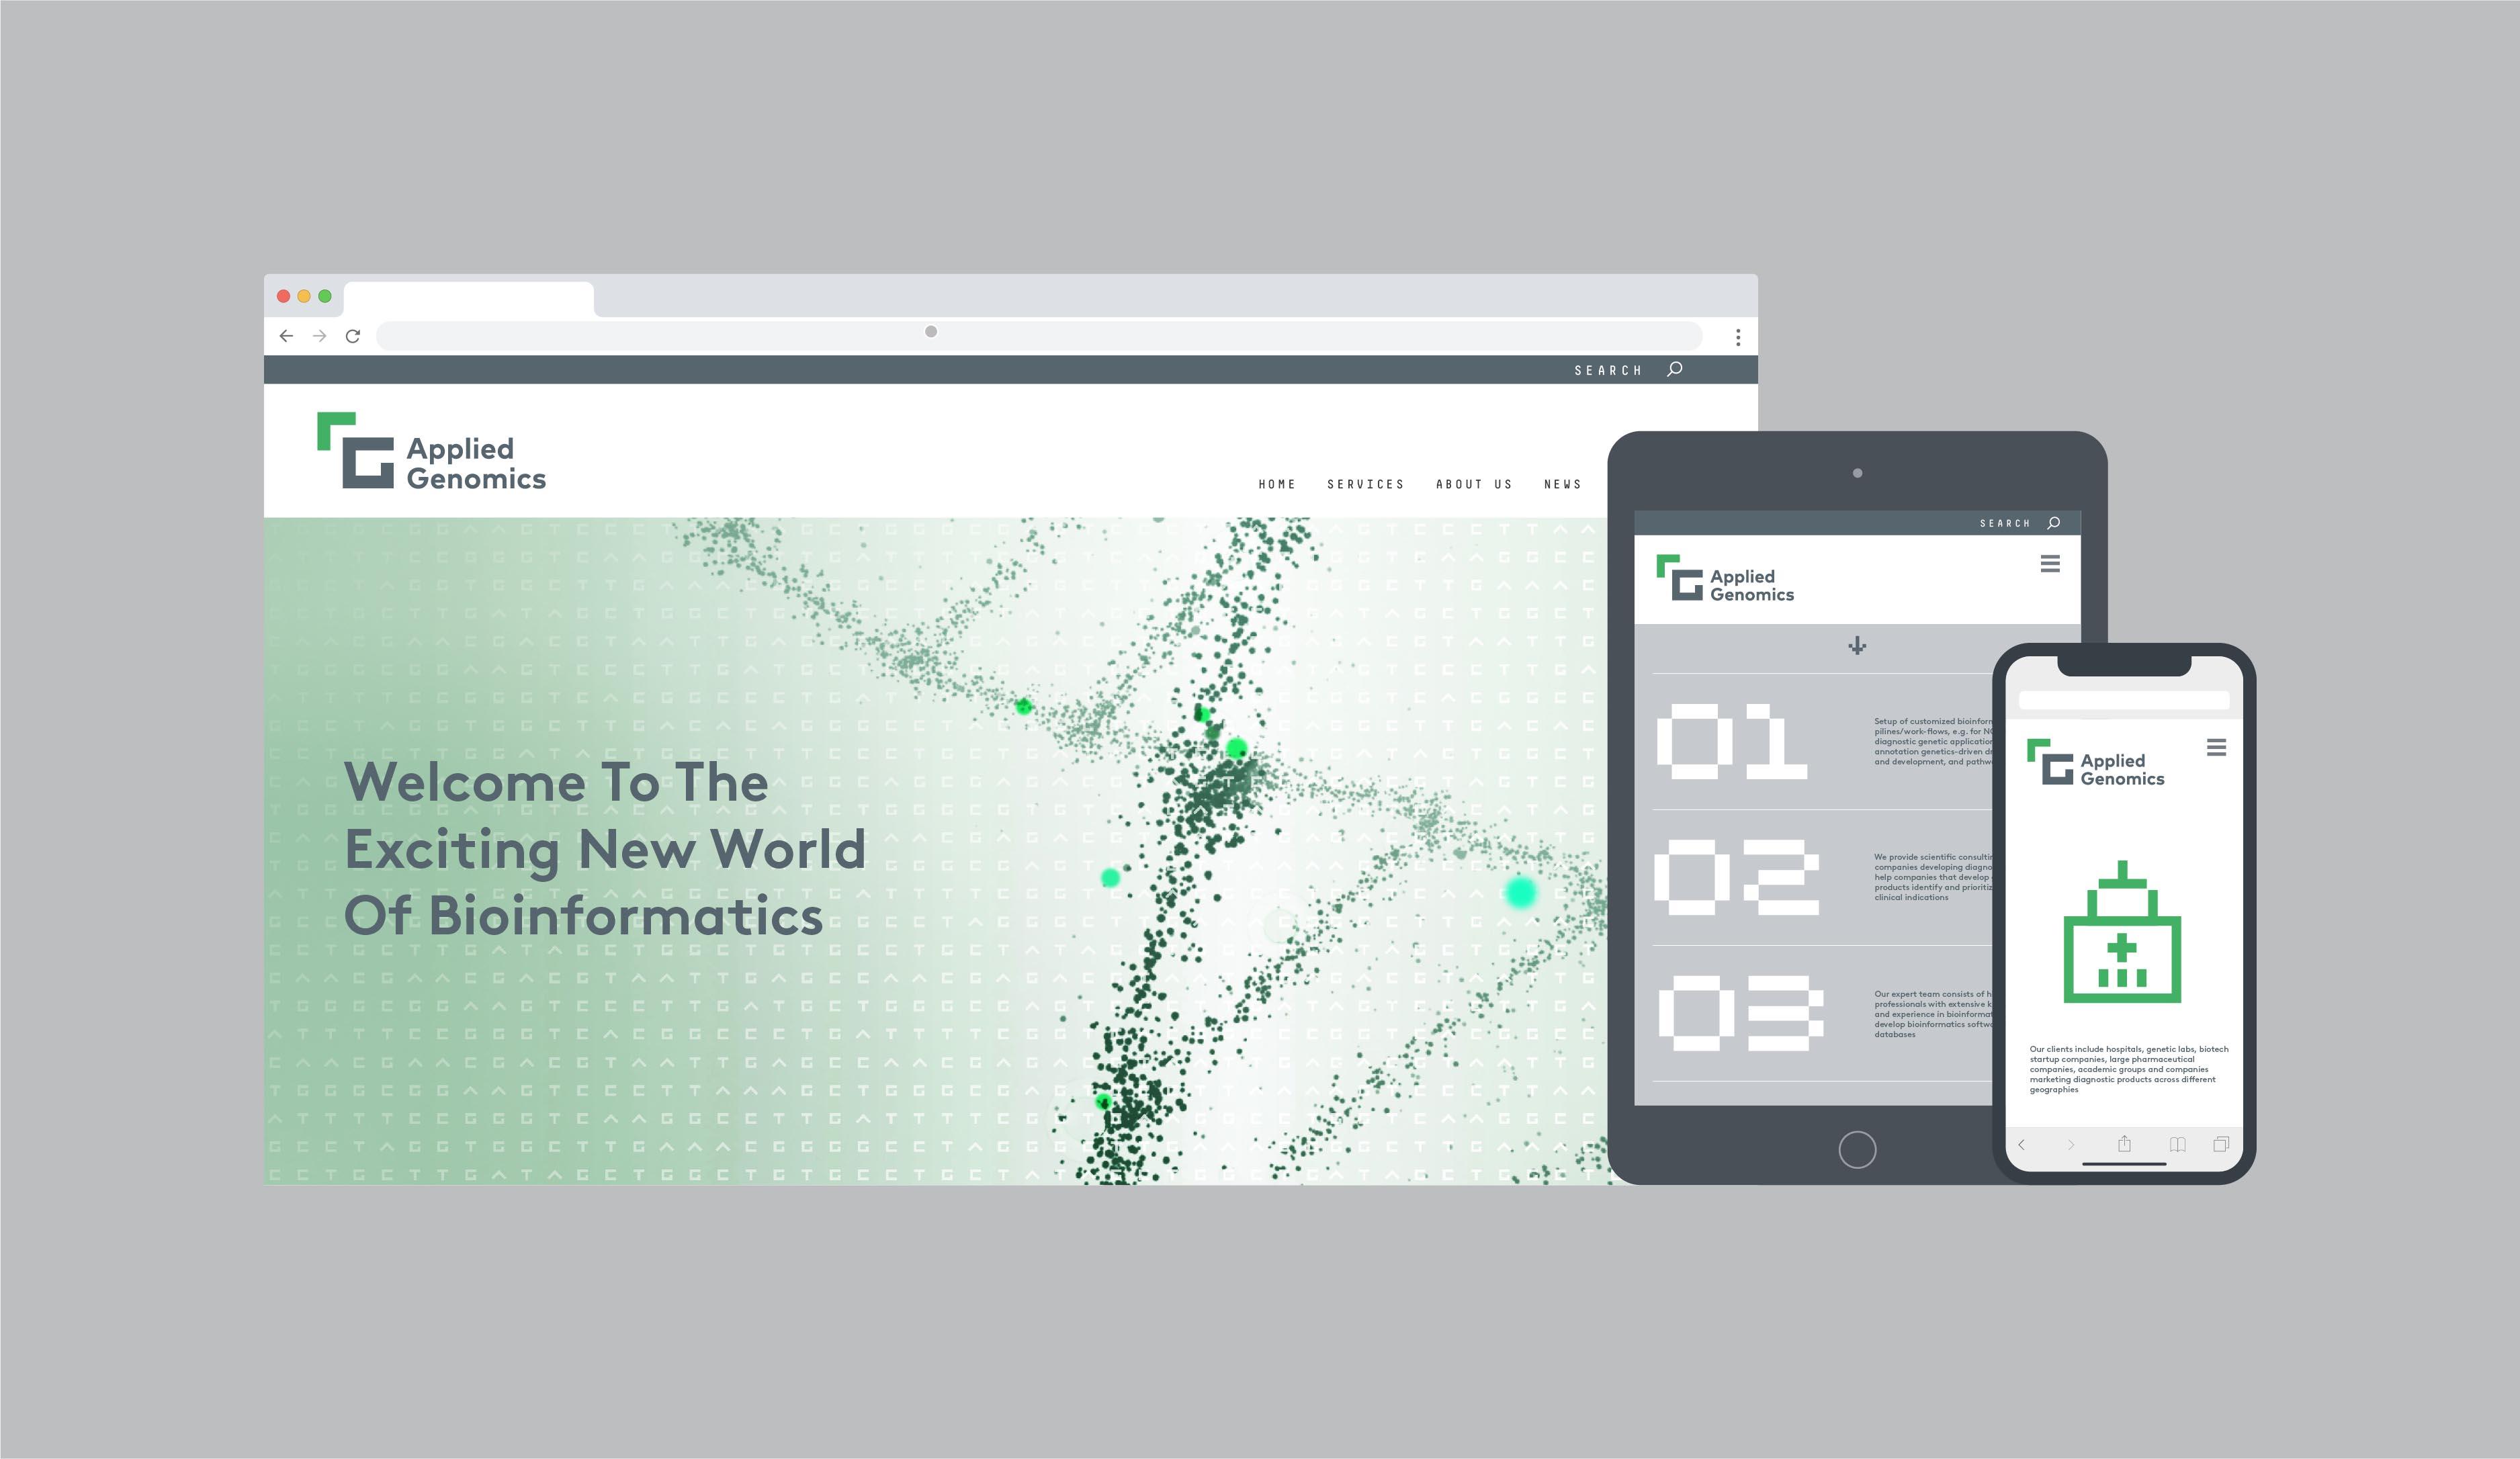 Applied Genomics brand identity and website design